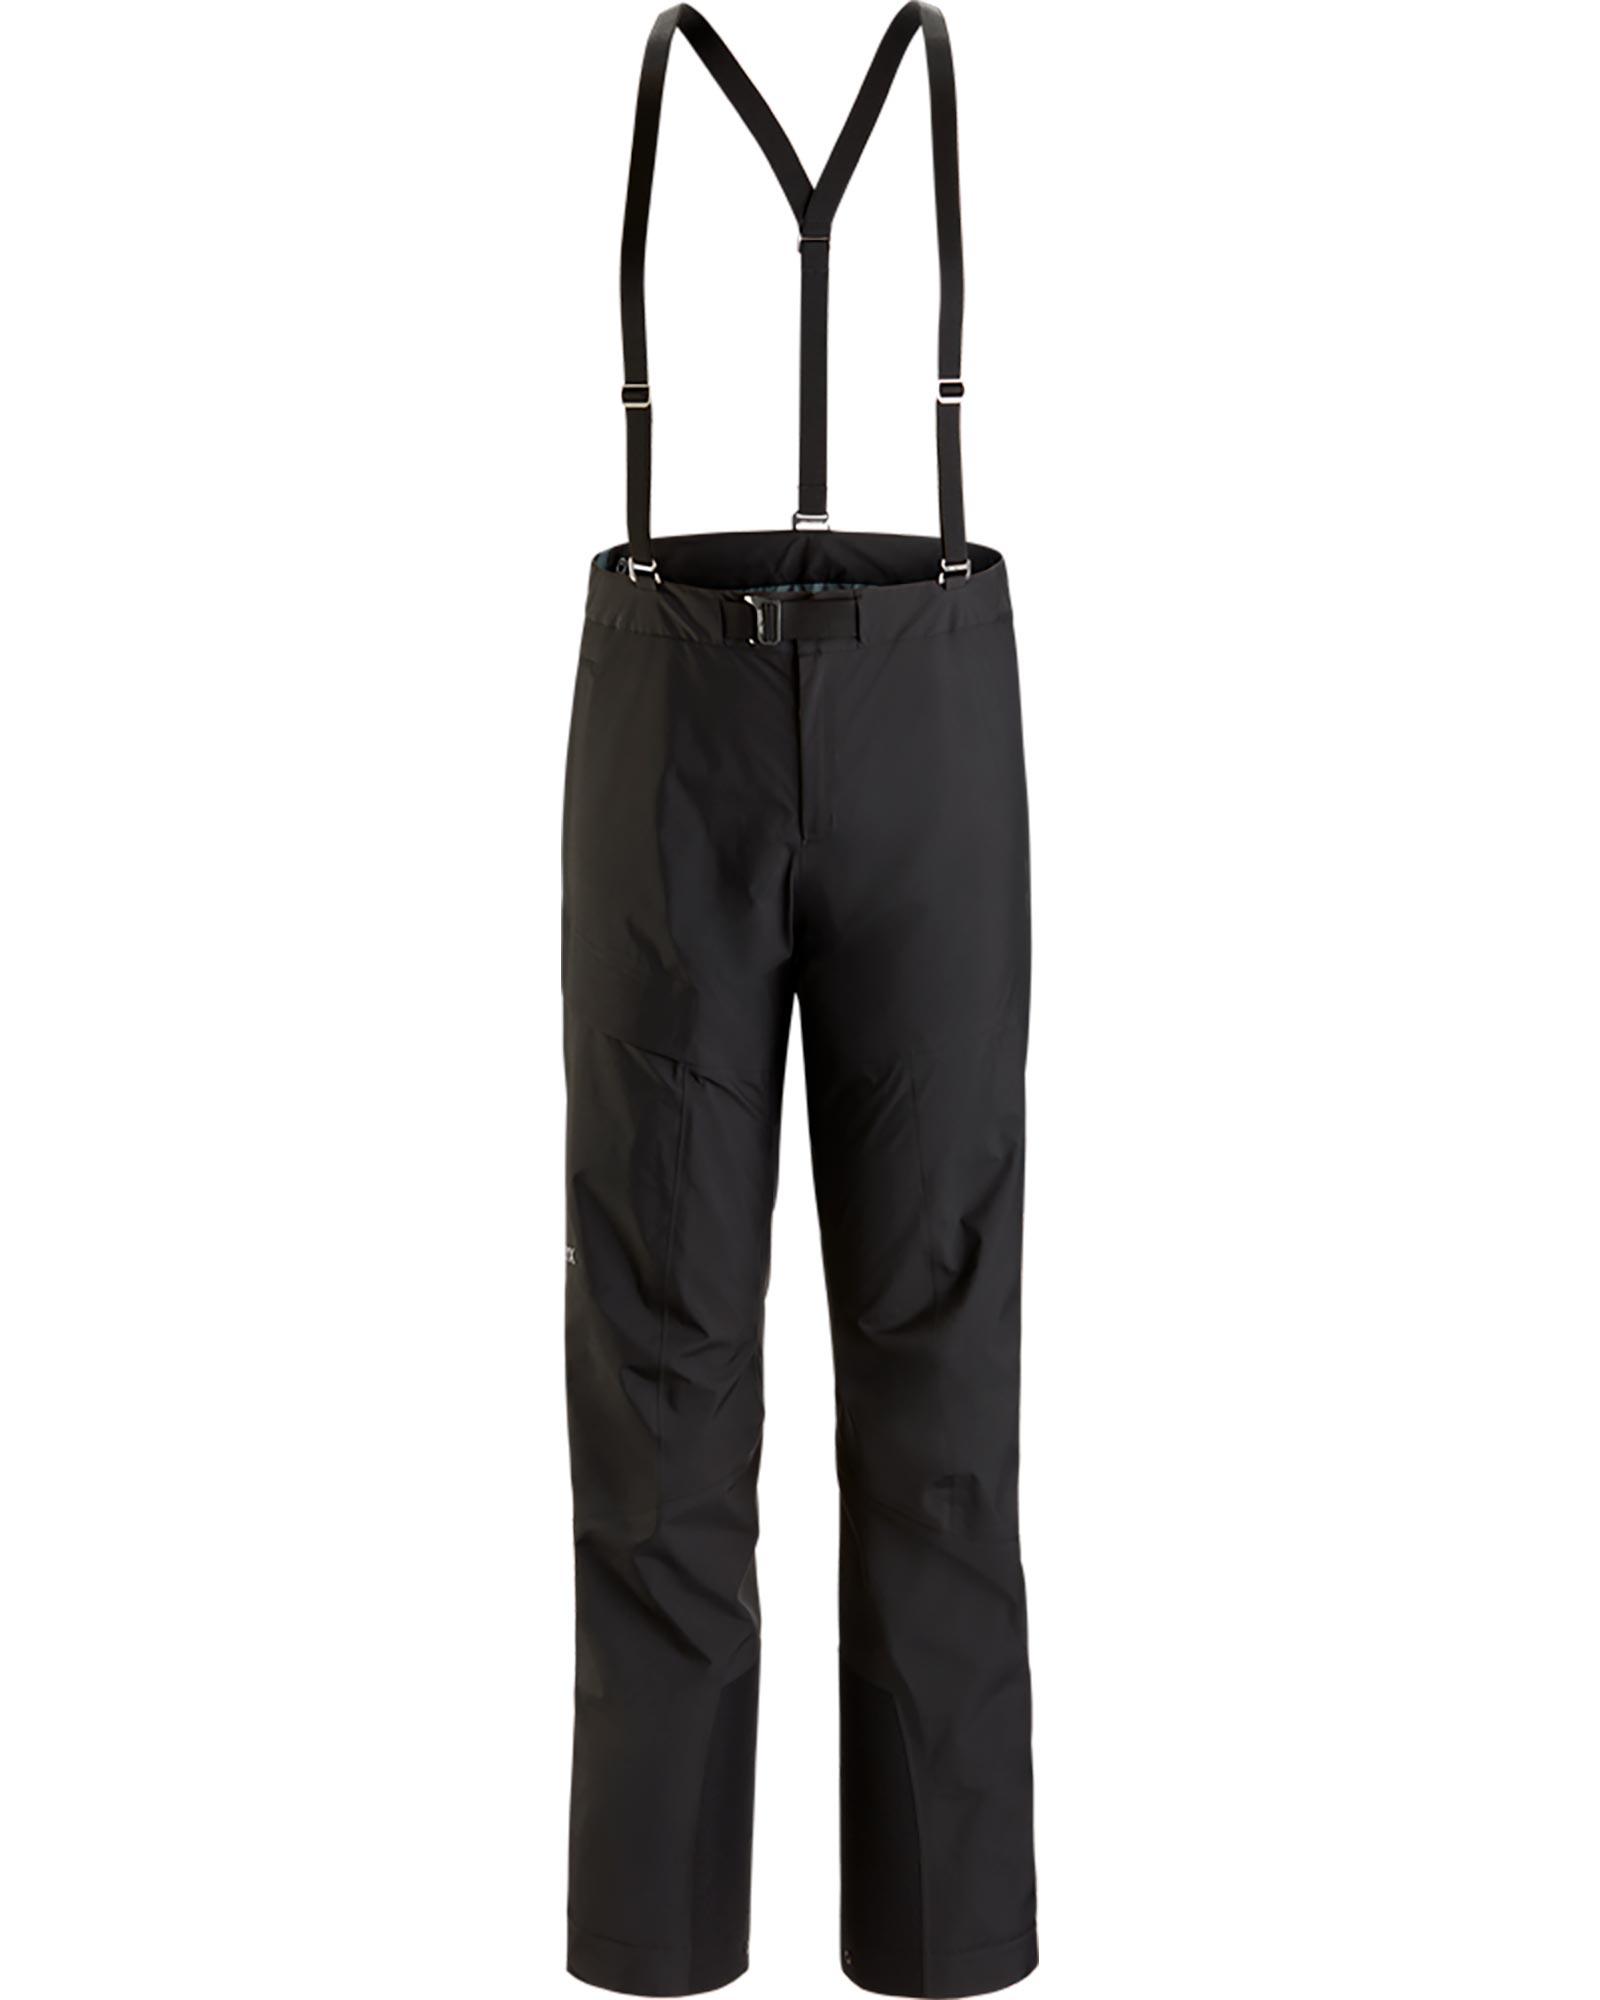 Arc'teryx Women's Beta AR GORE-TEX Pants 0